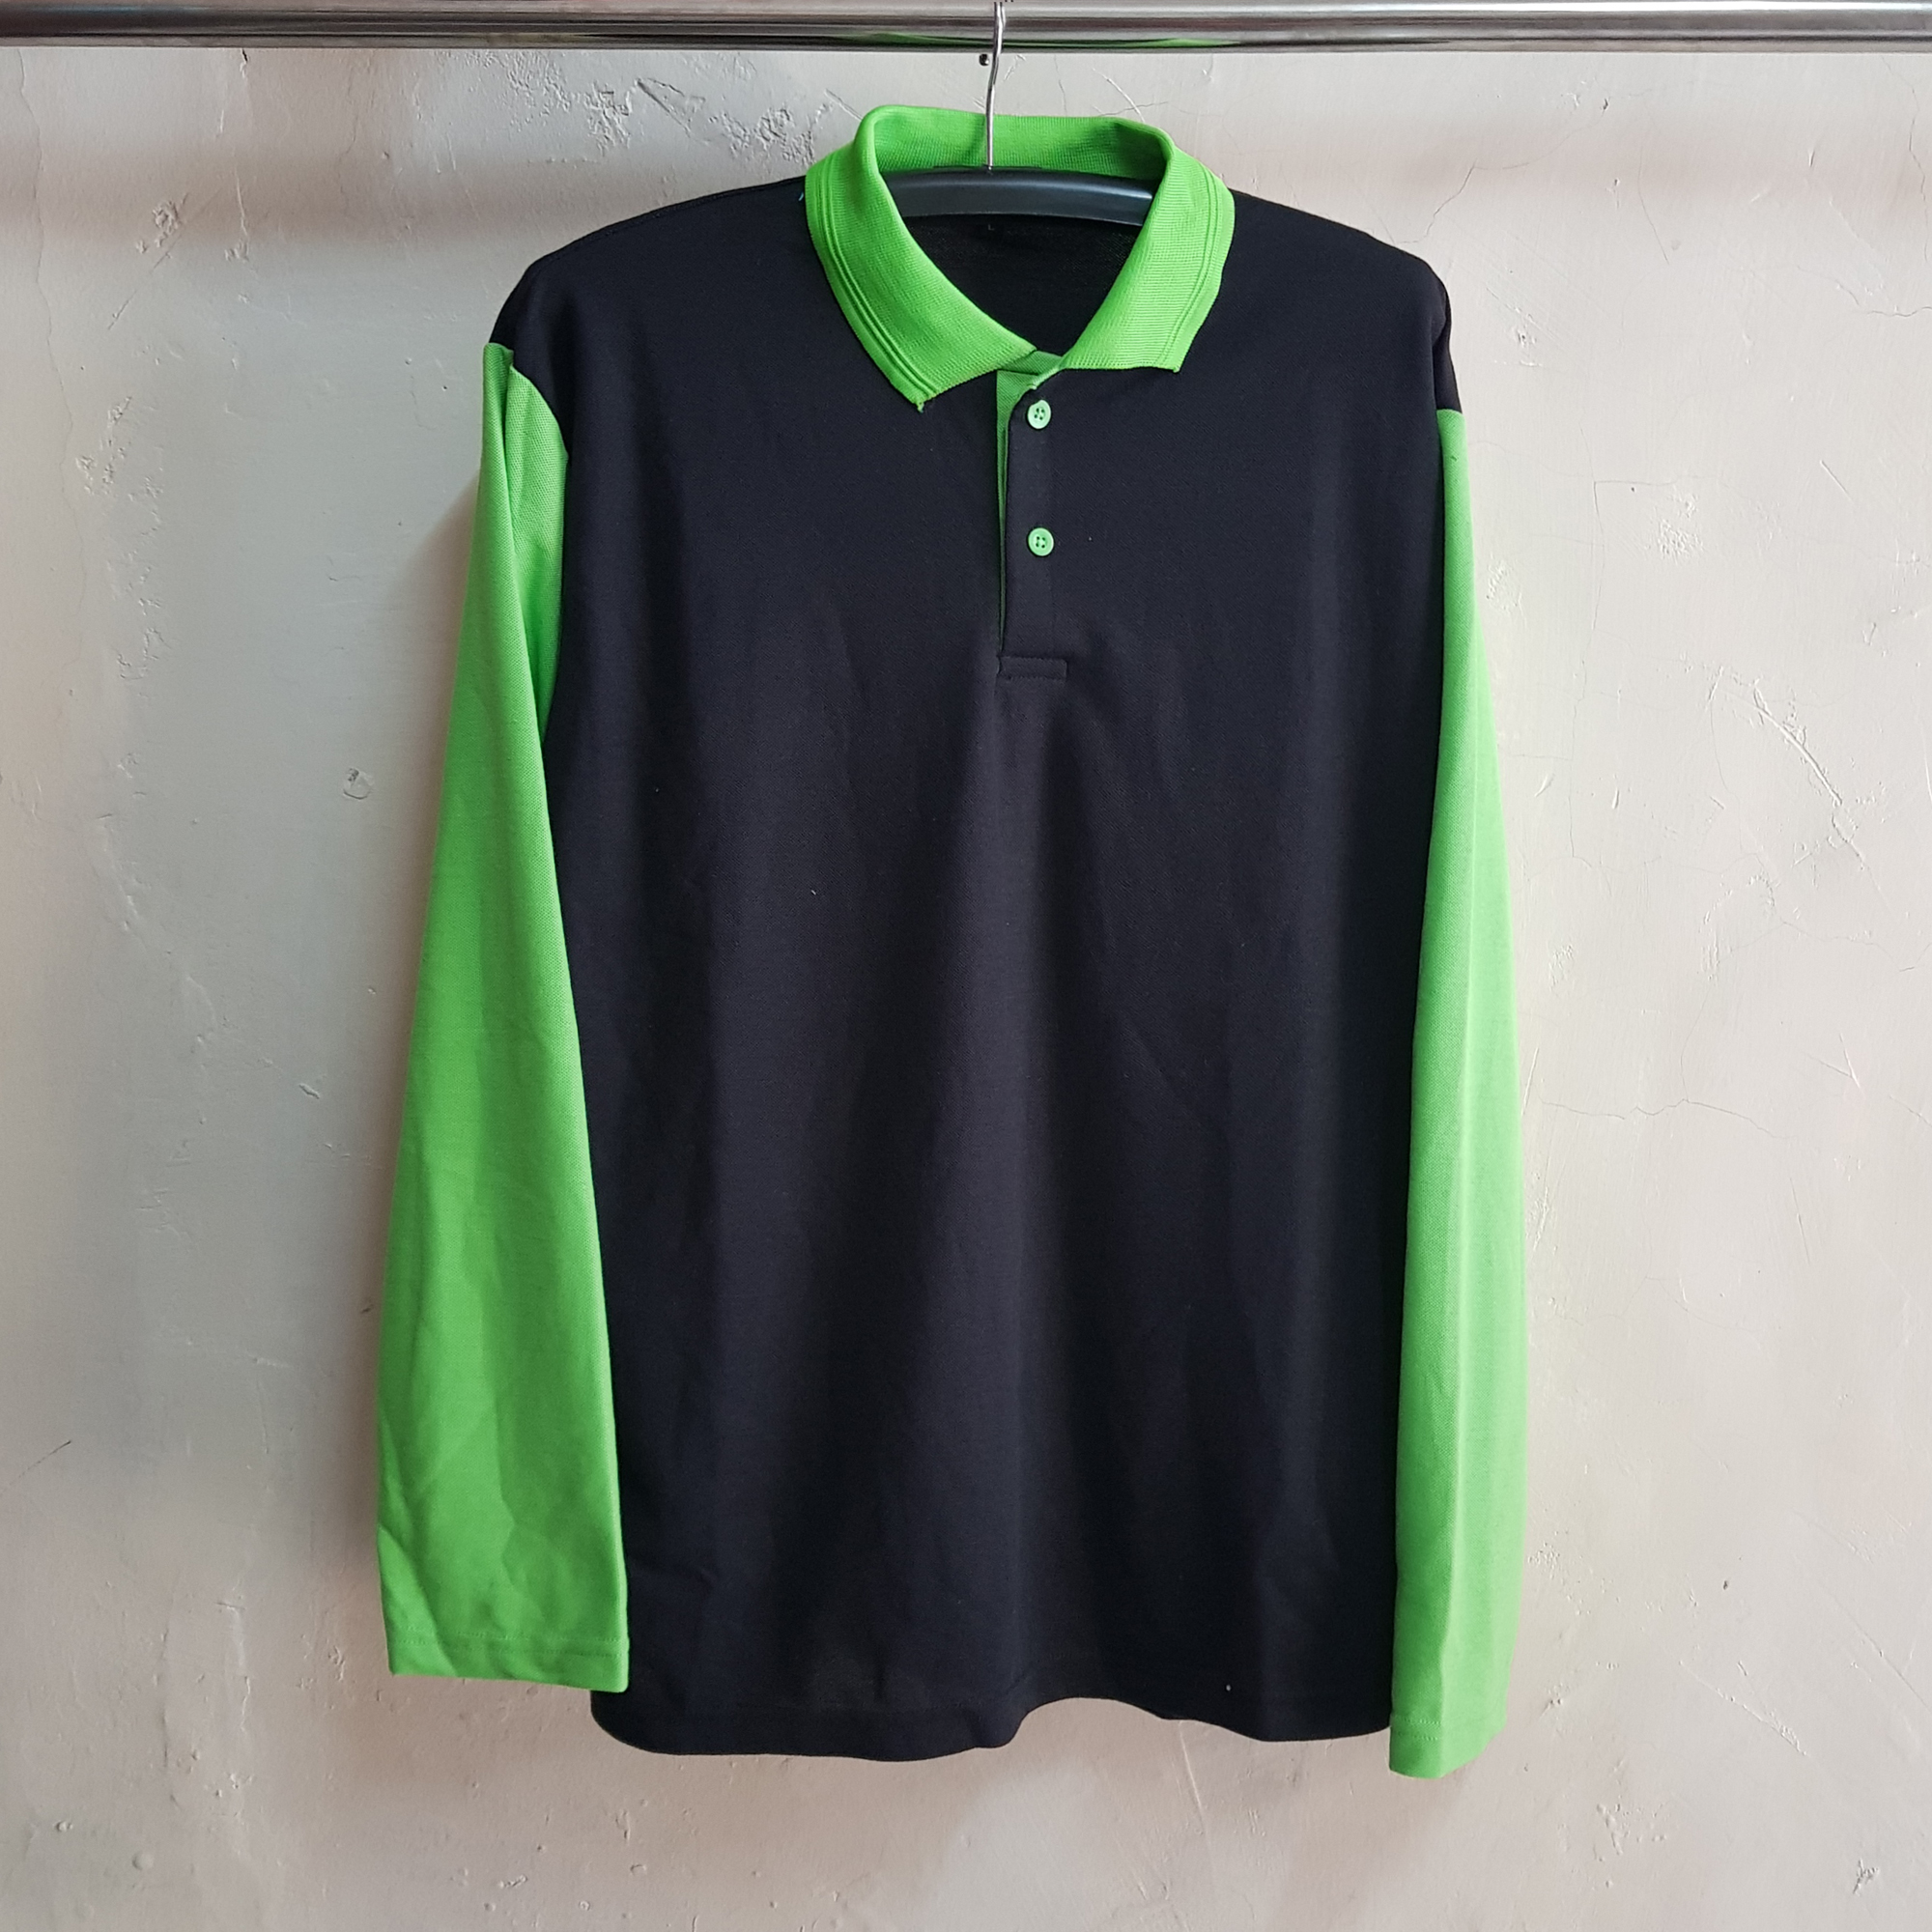 Seragam Dasa Wisma, Poloshirt & Training